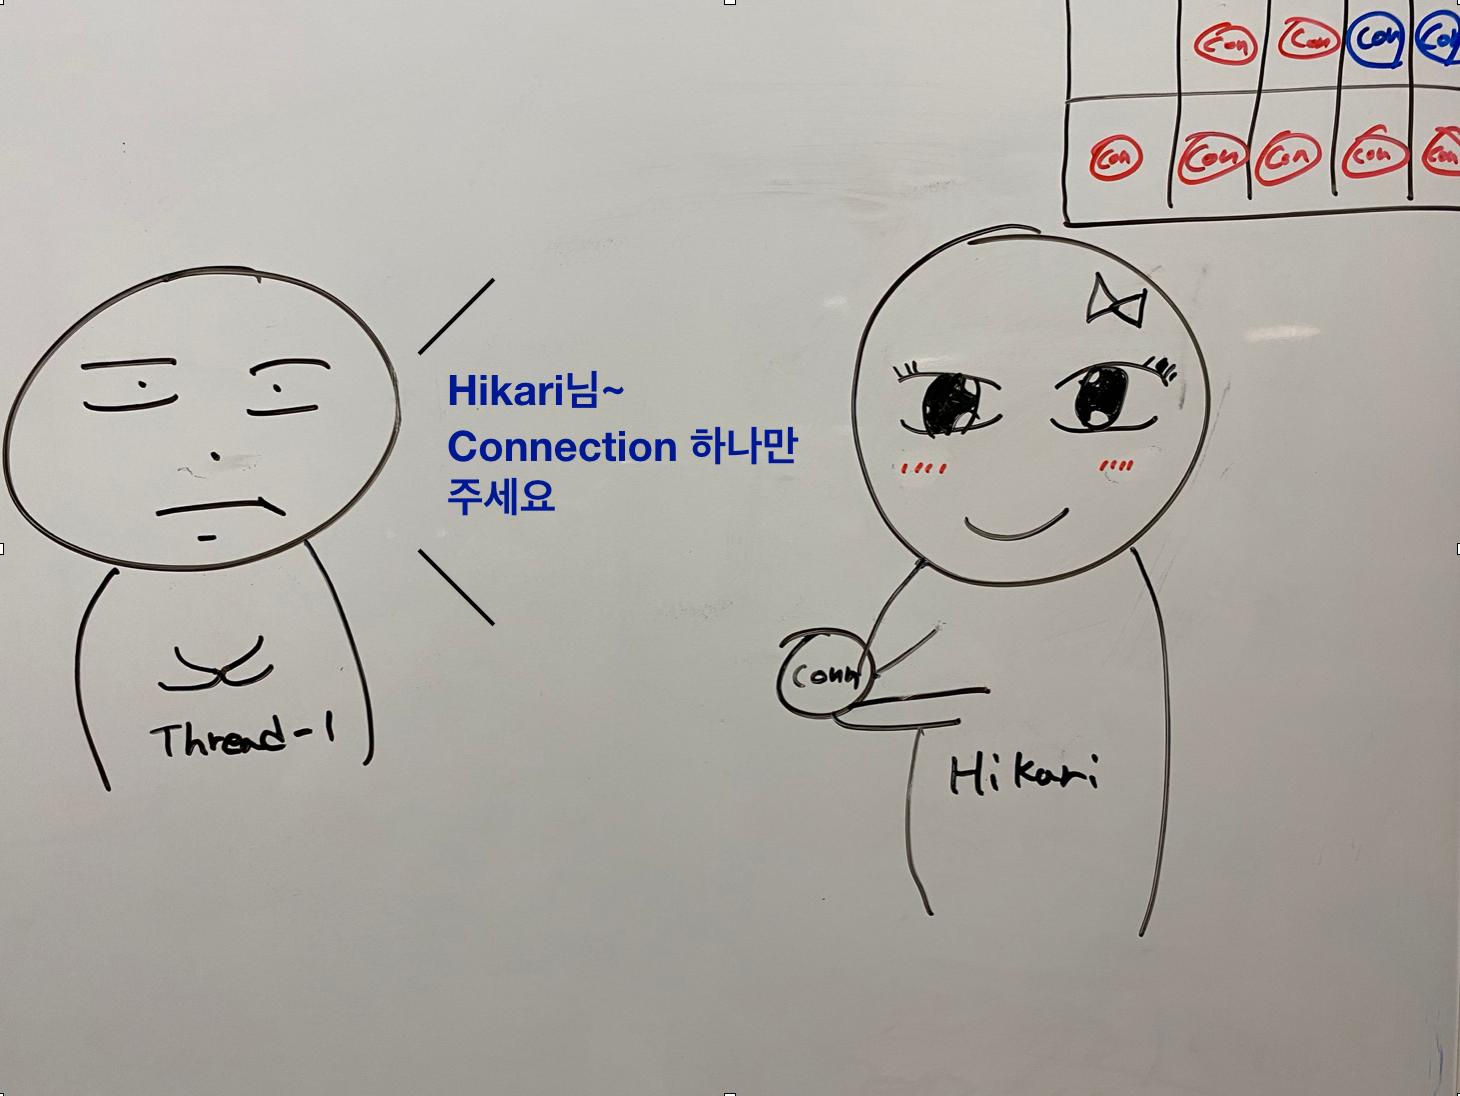 hikari-give-me-a-connection